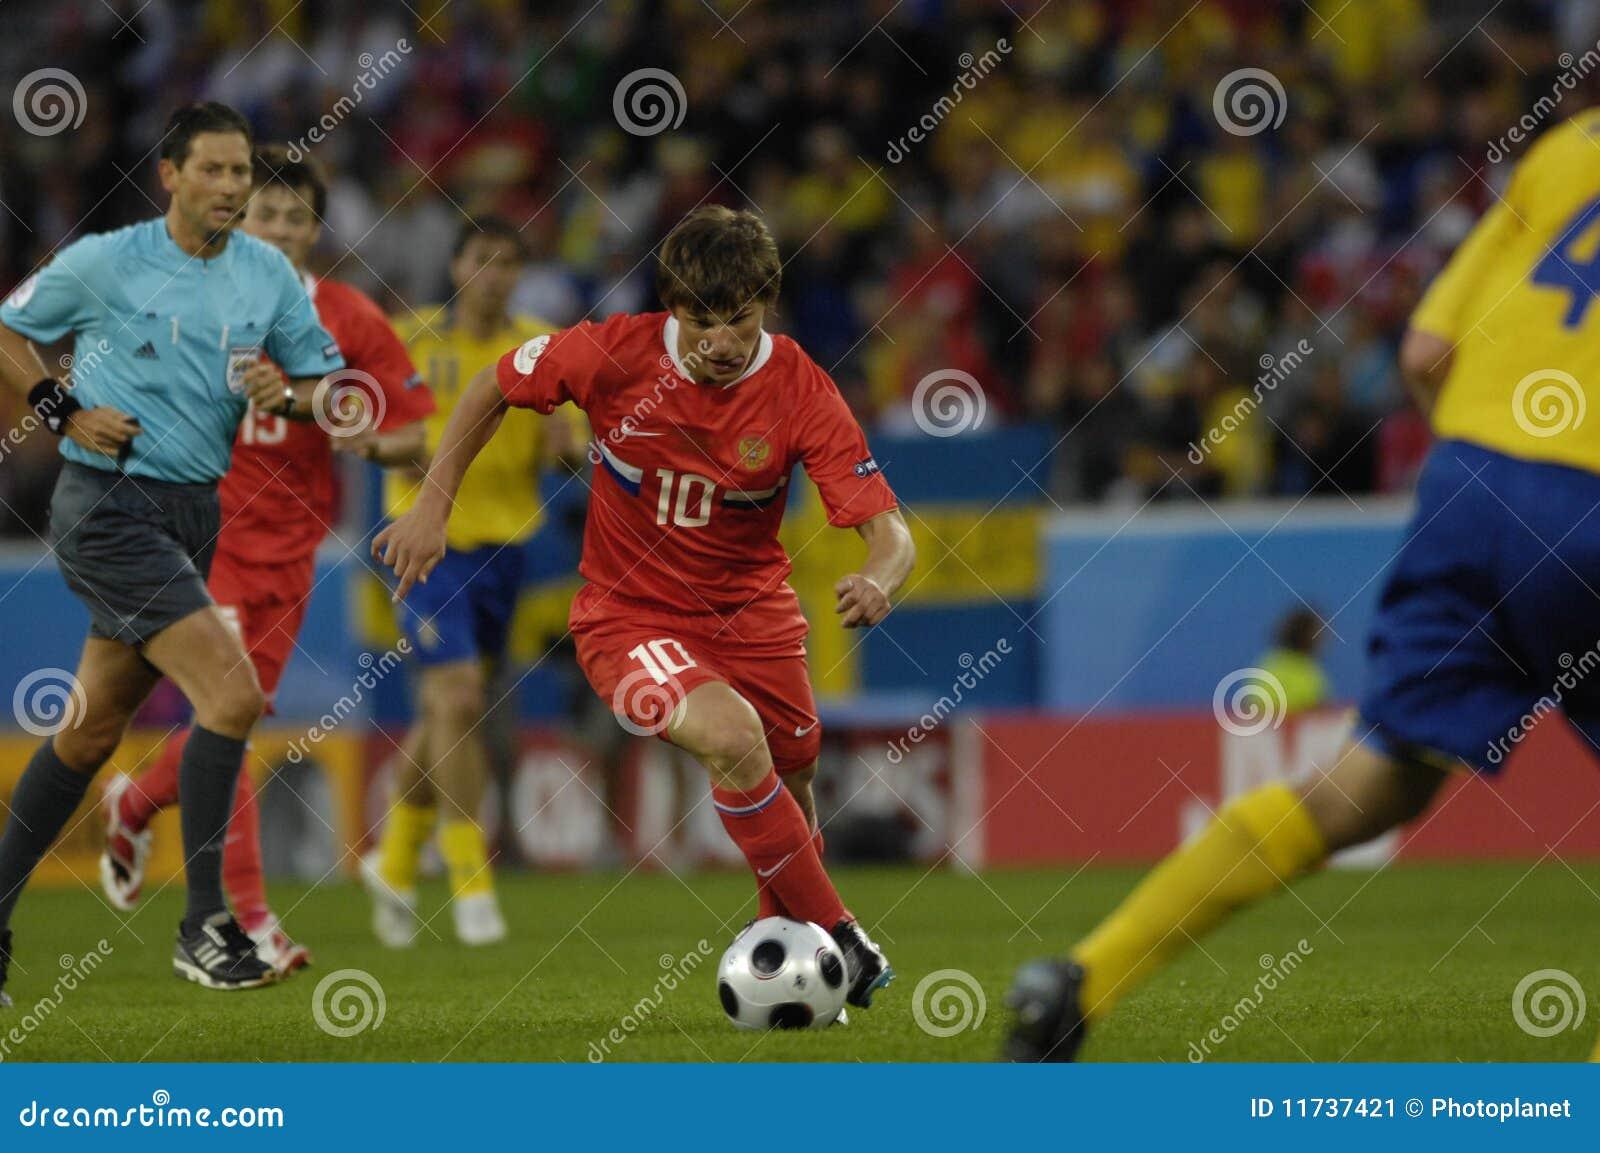 Francefootball arshavin andrei 2009 30players самое лучшее